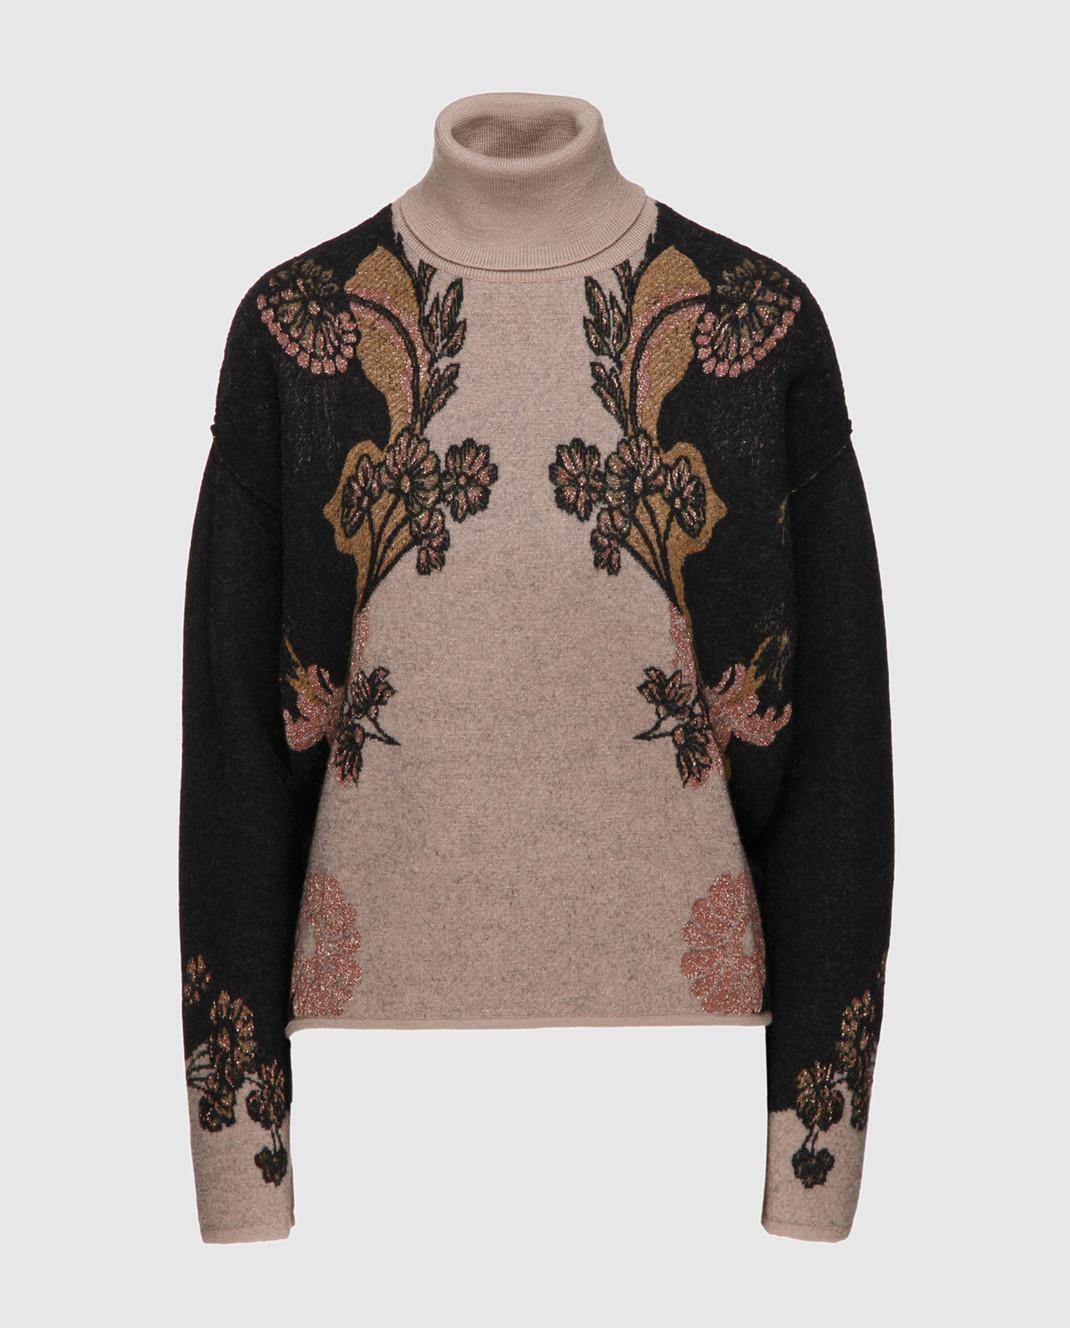 Etro Коричневый свитер из шерсти D156239303